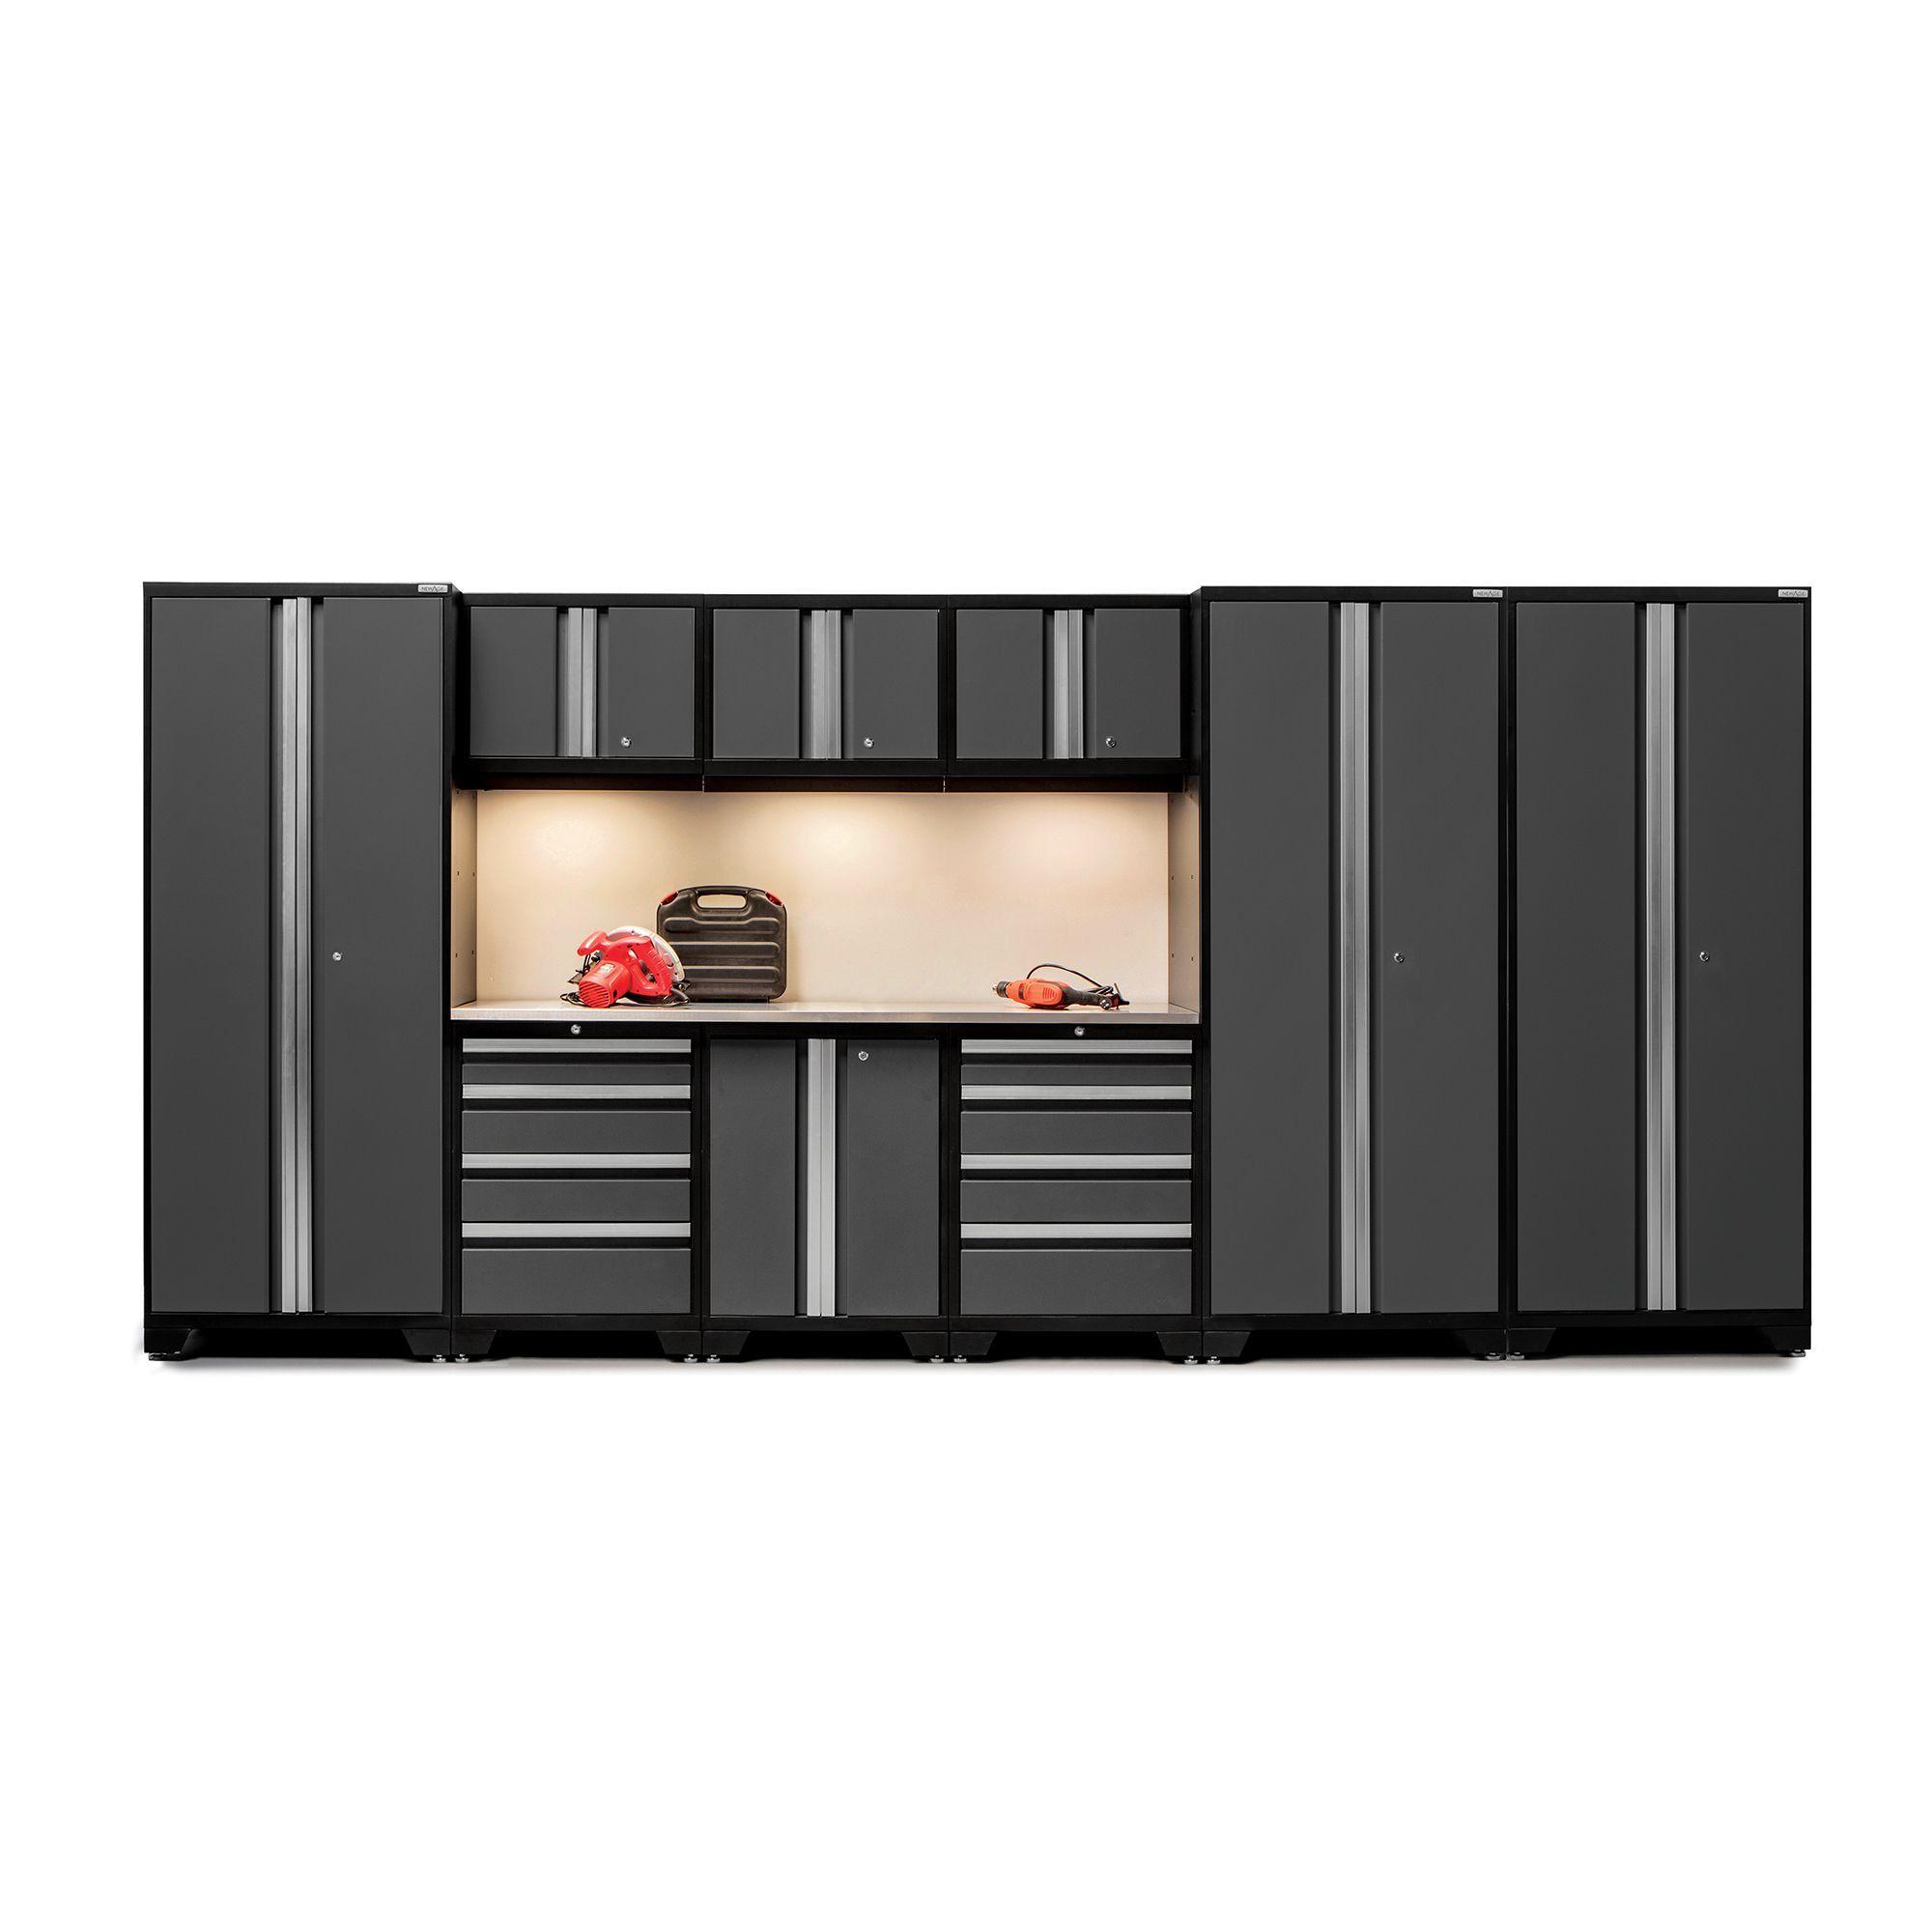 NewAge Products Bold Series Steel/Stainless Steel 10-piece Locker Set (